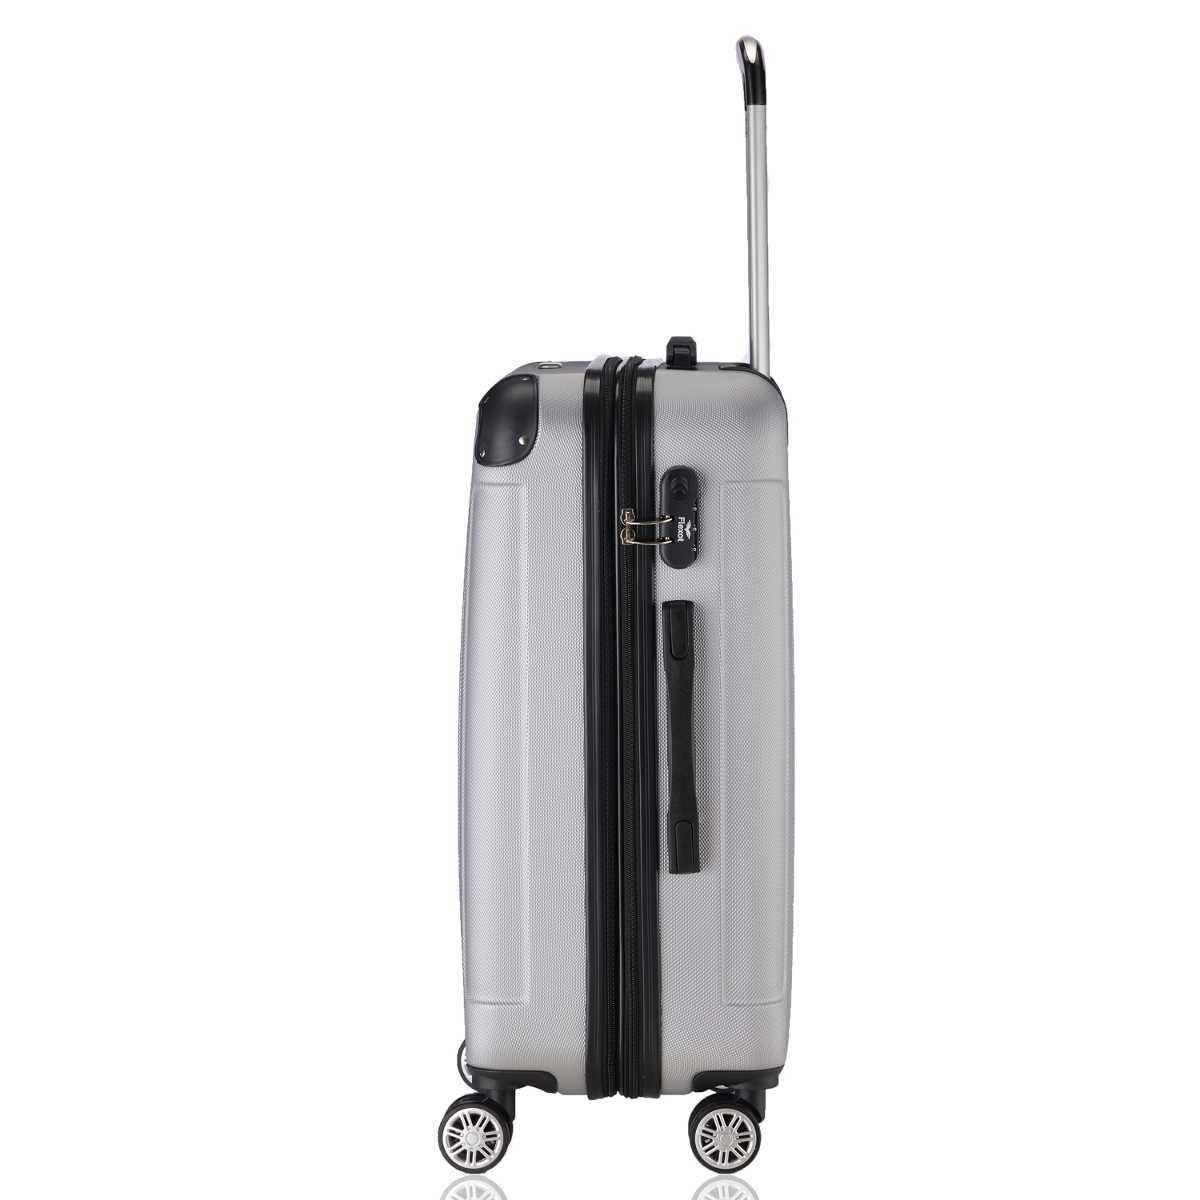 Koffer-Flexot-2045-Hartschalenkoffer-Trolley-Kofferset-Reisekoffer-M-L-XL-Set Indexbild 70